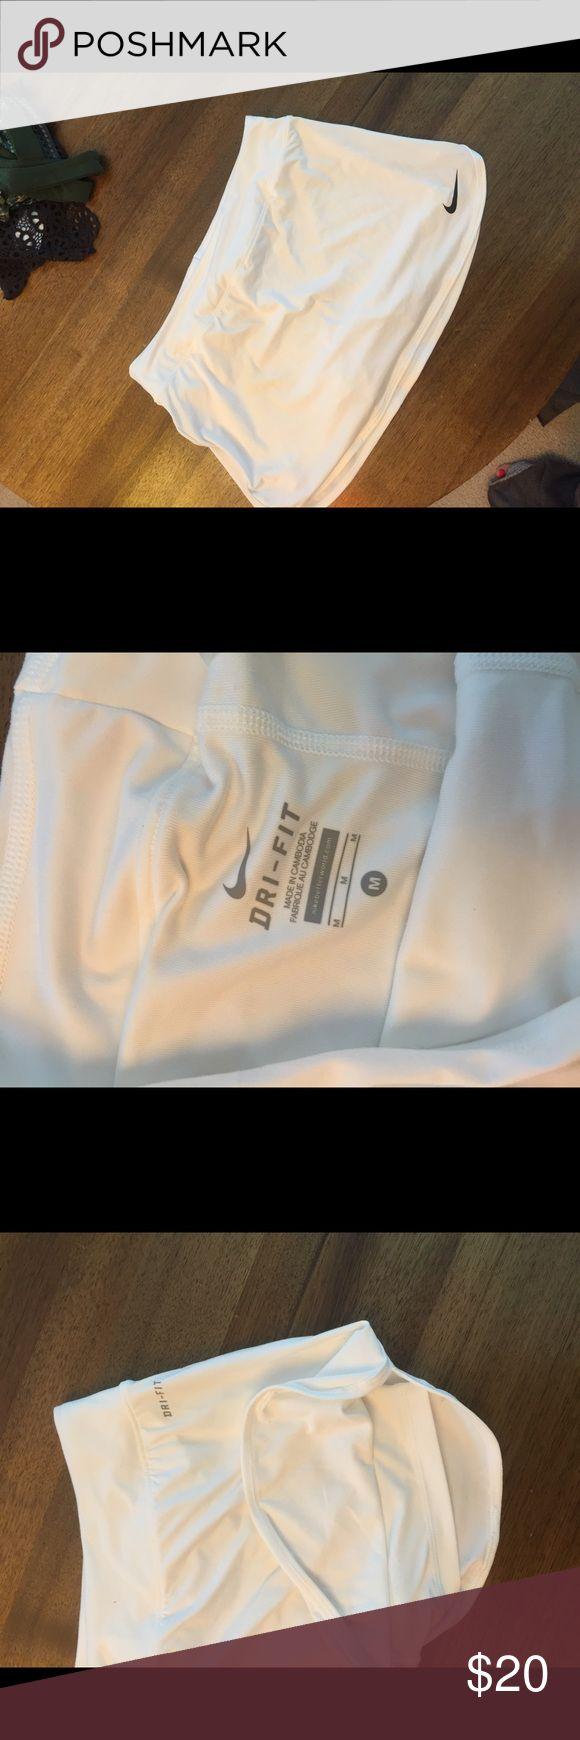 Womens white nike tennis skirt Dri-fit athletic tennis skirt Nike Skirts